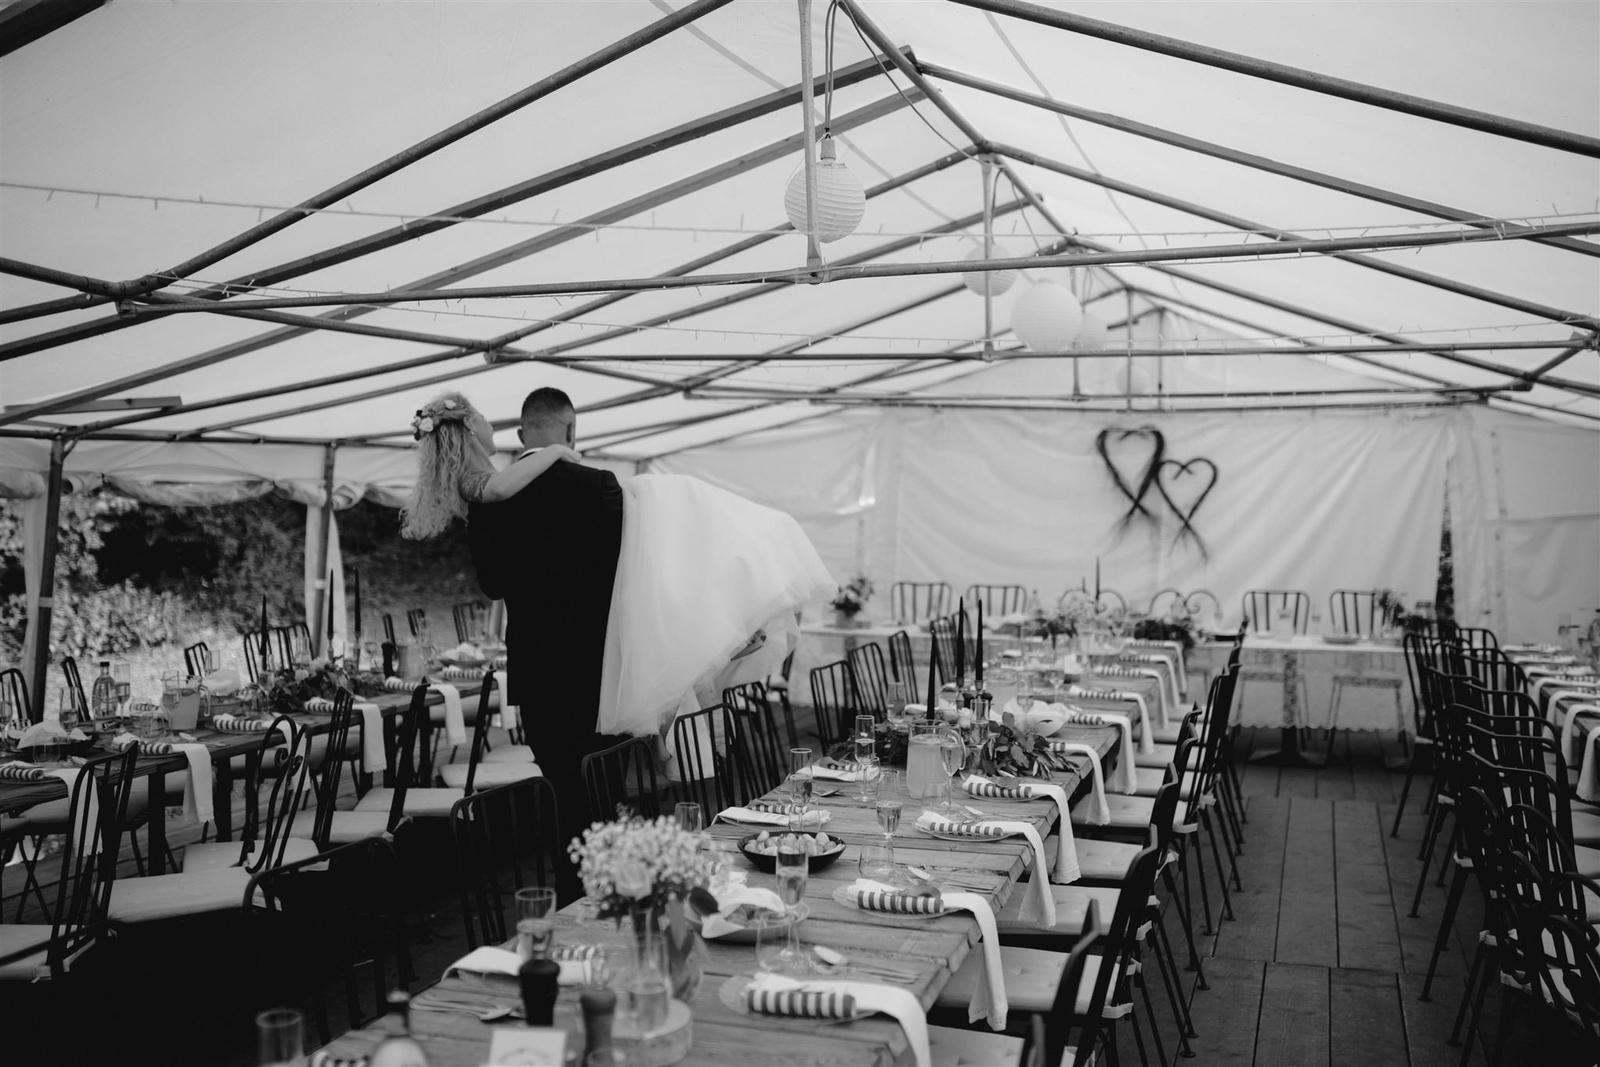 Krásna a romantická svadobná party v záhrade reštaurácie Bistra Dukát - Le Gout v srdci B. Bystrice. - Obrázok č. 16